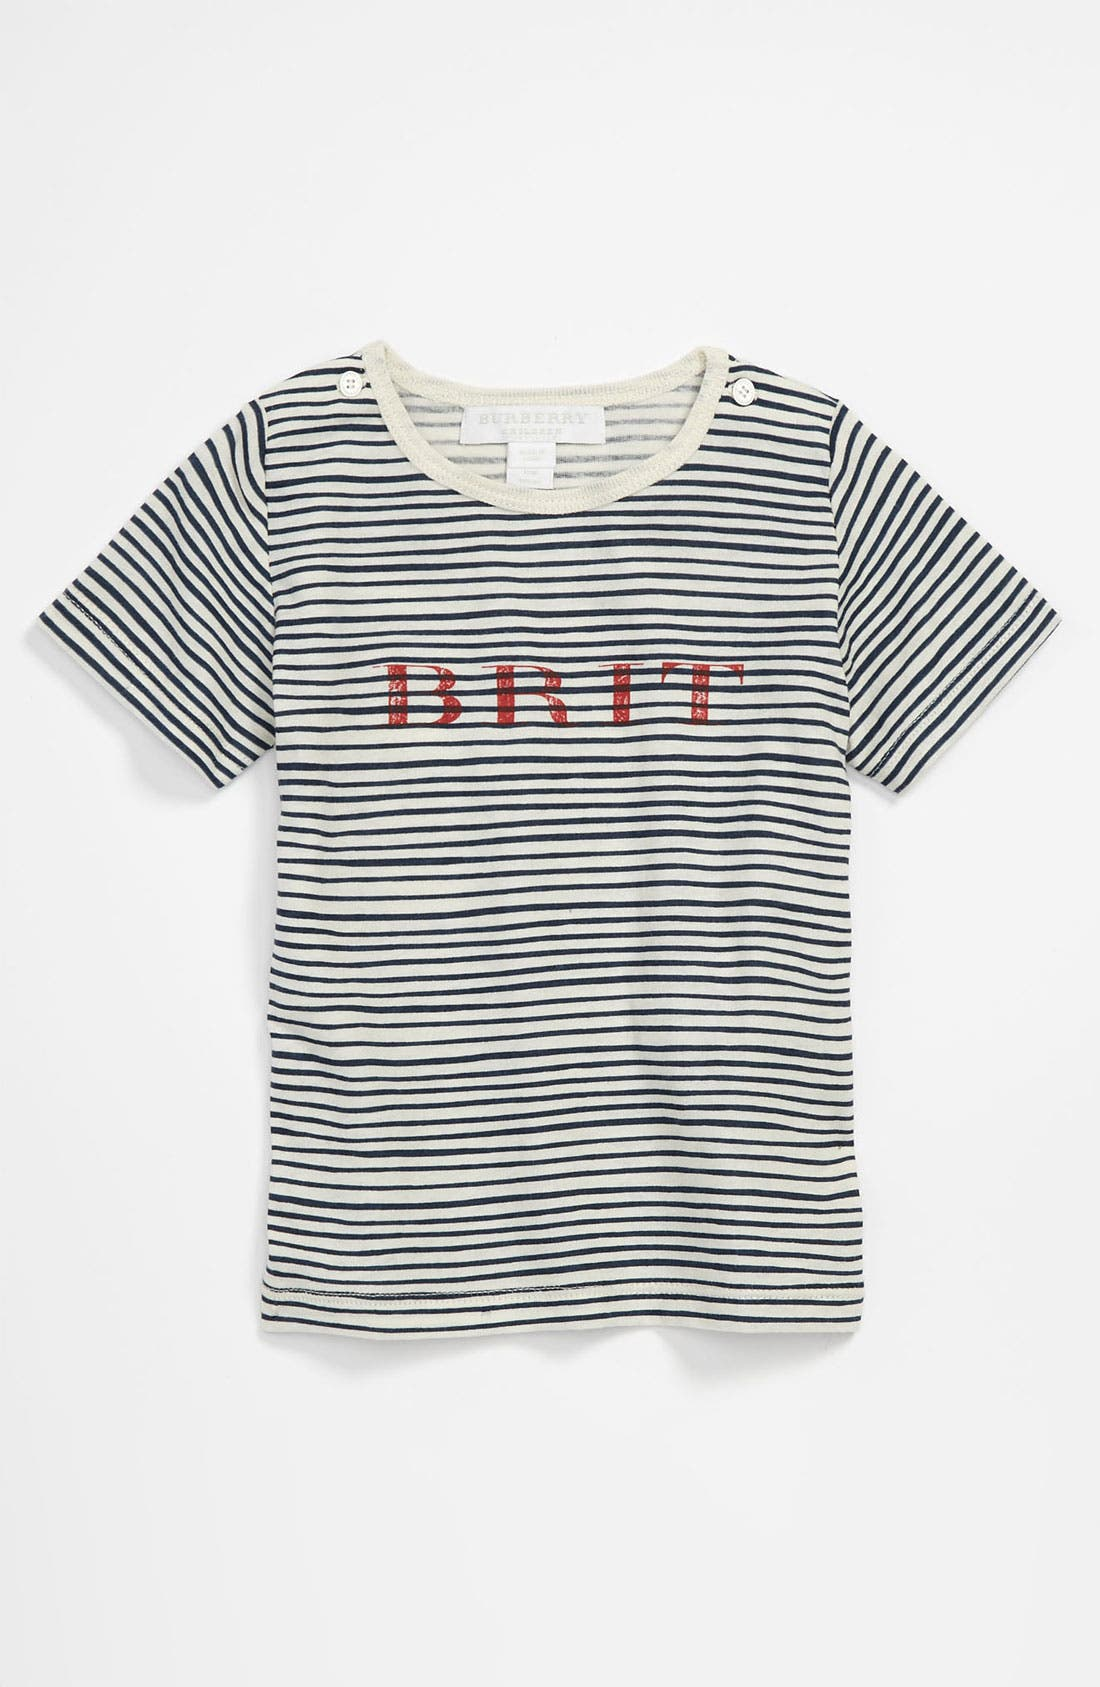 Alternate Image 1 Selected - Burberry 'Mini Treague' Stripe T-Shirt (Infant)